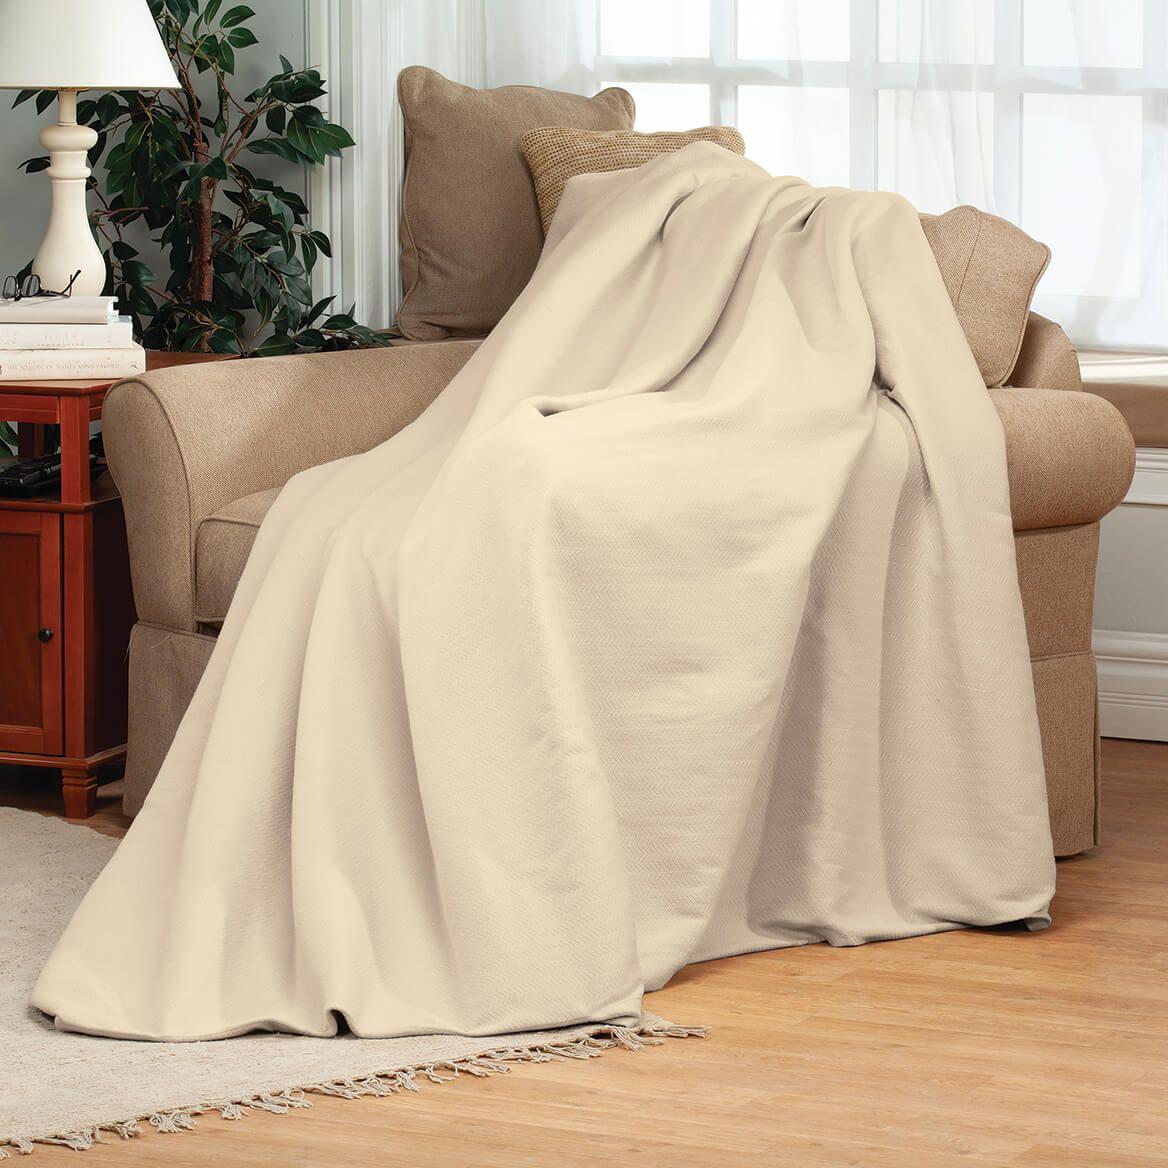 Woven Extra-Soft Cotton Blanket by OakRidge™-364591